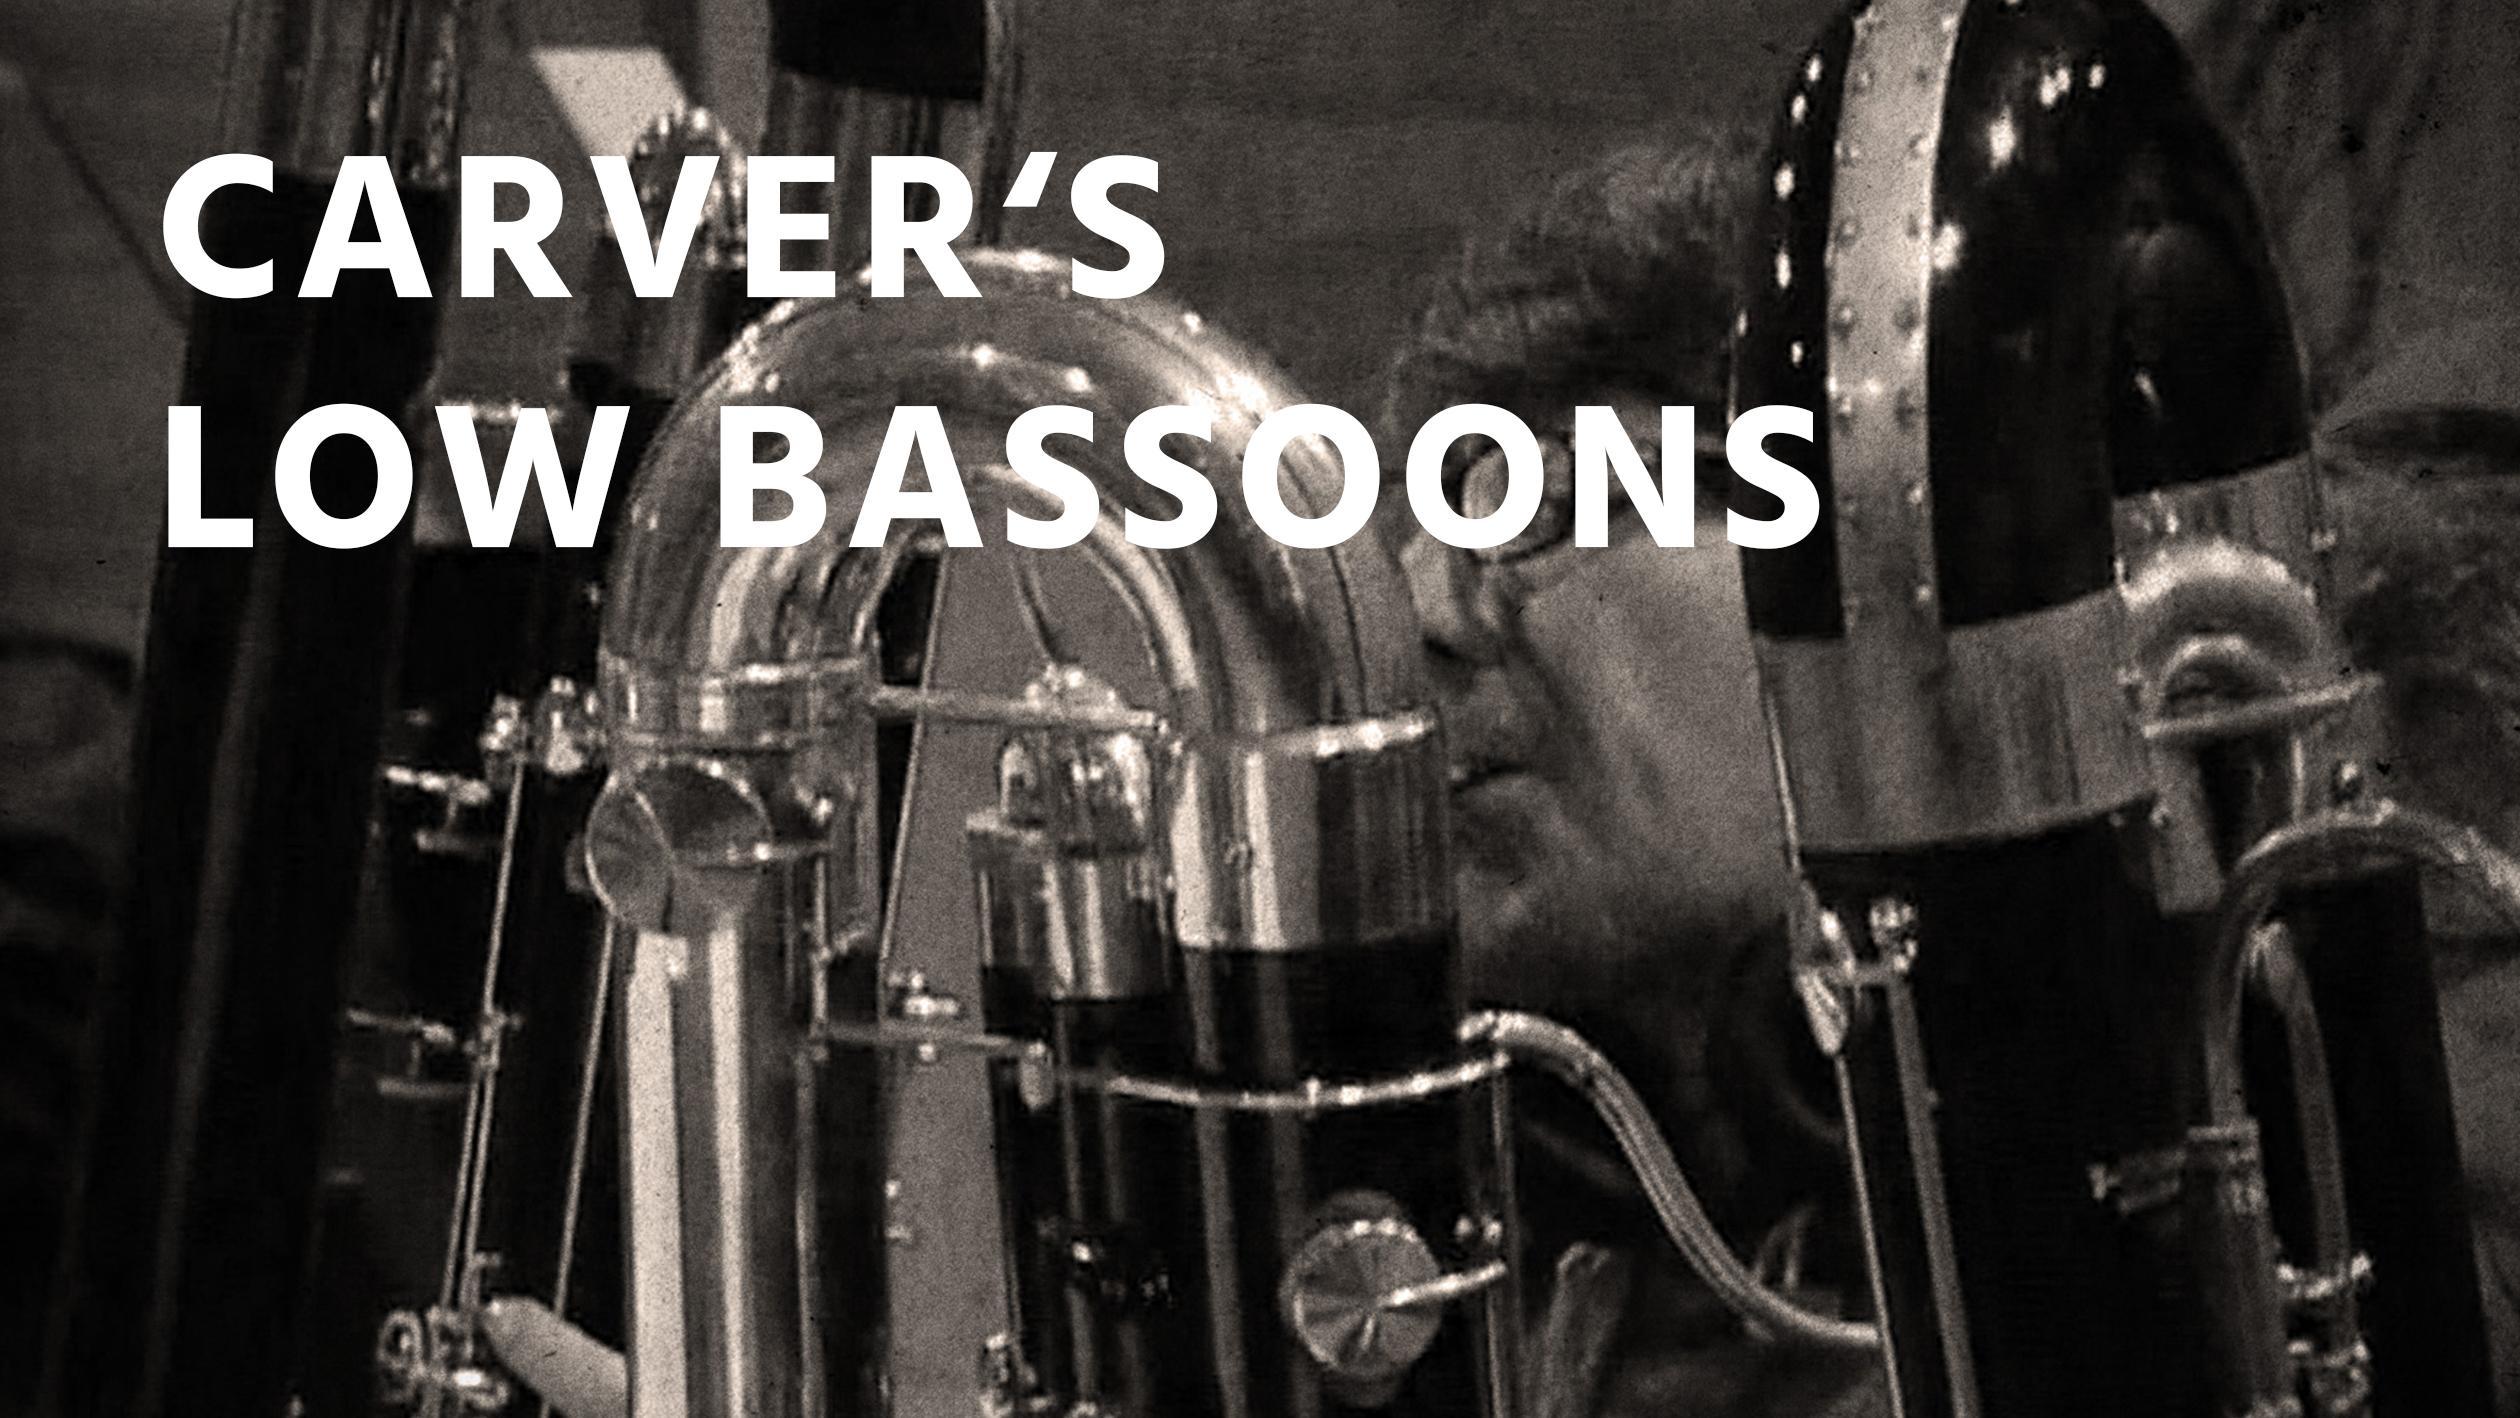 Carvers Low Bassoon Ensemble